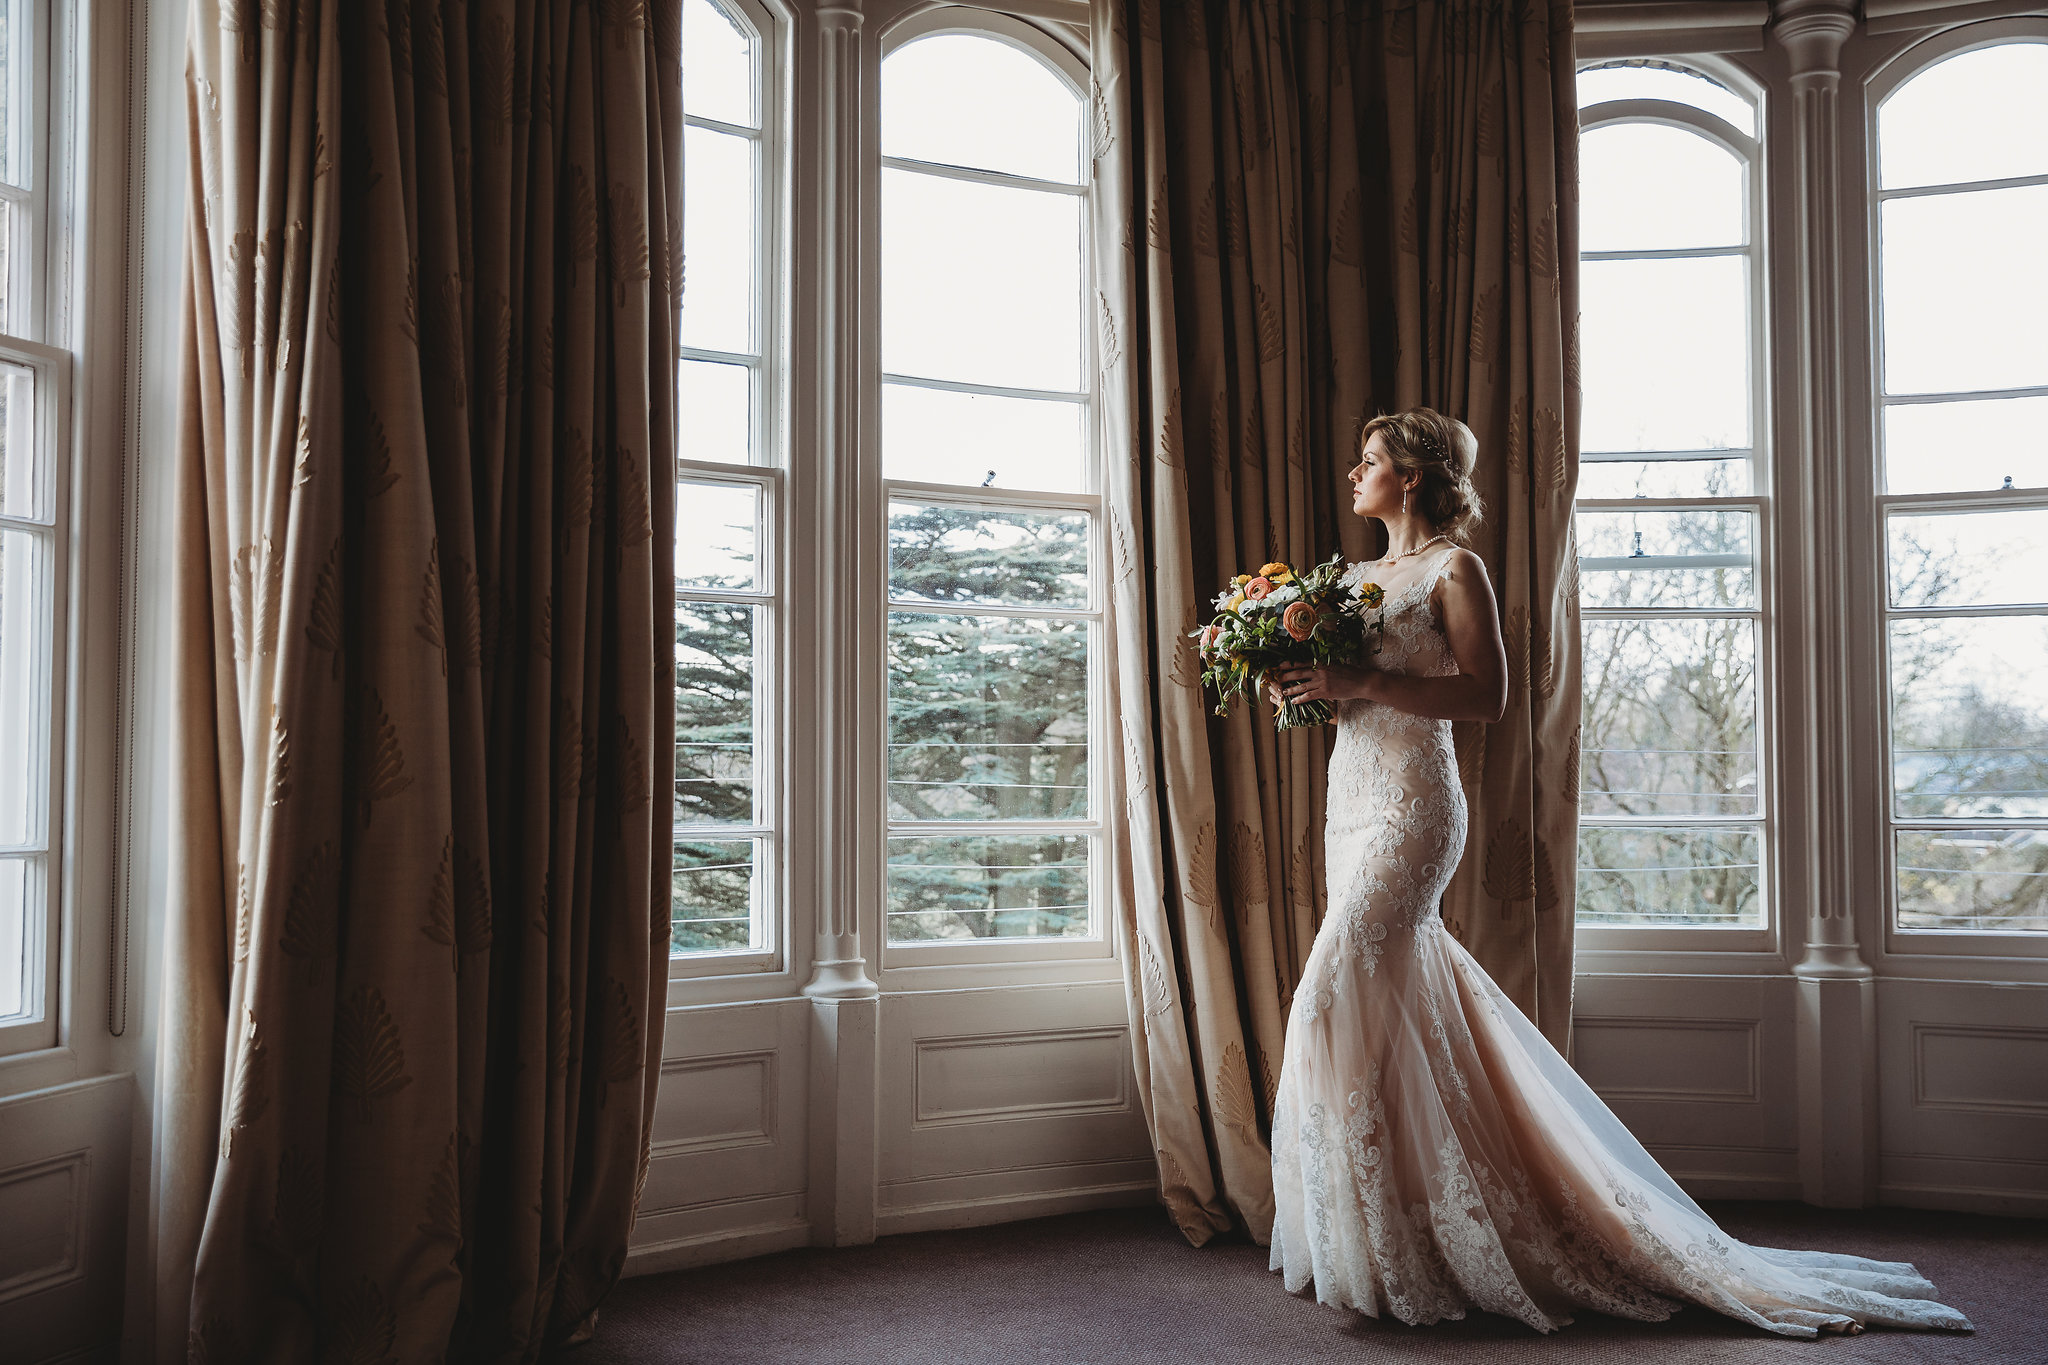 Ashley Sims wedding dress Cambridge